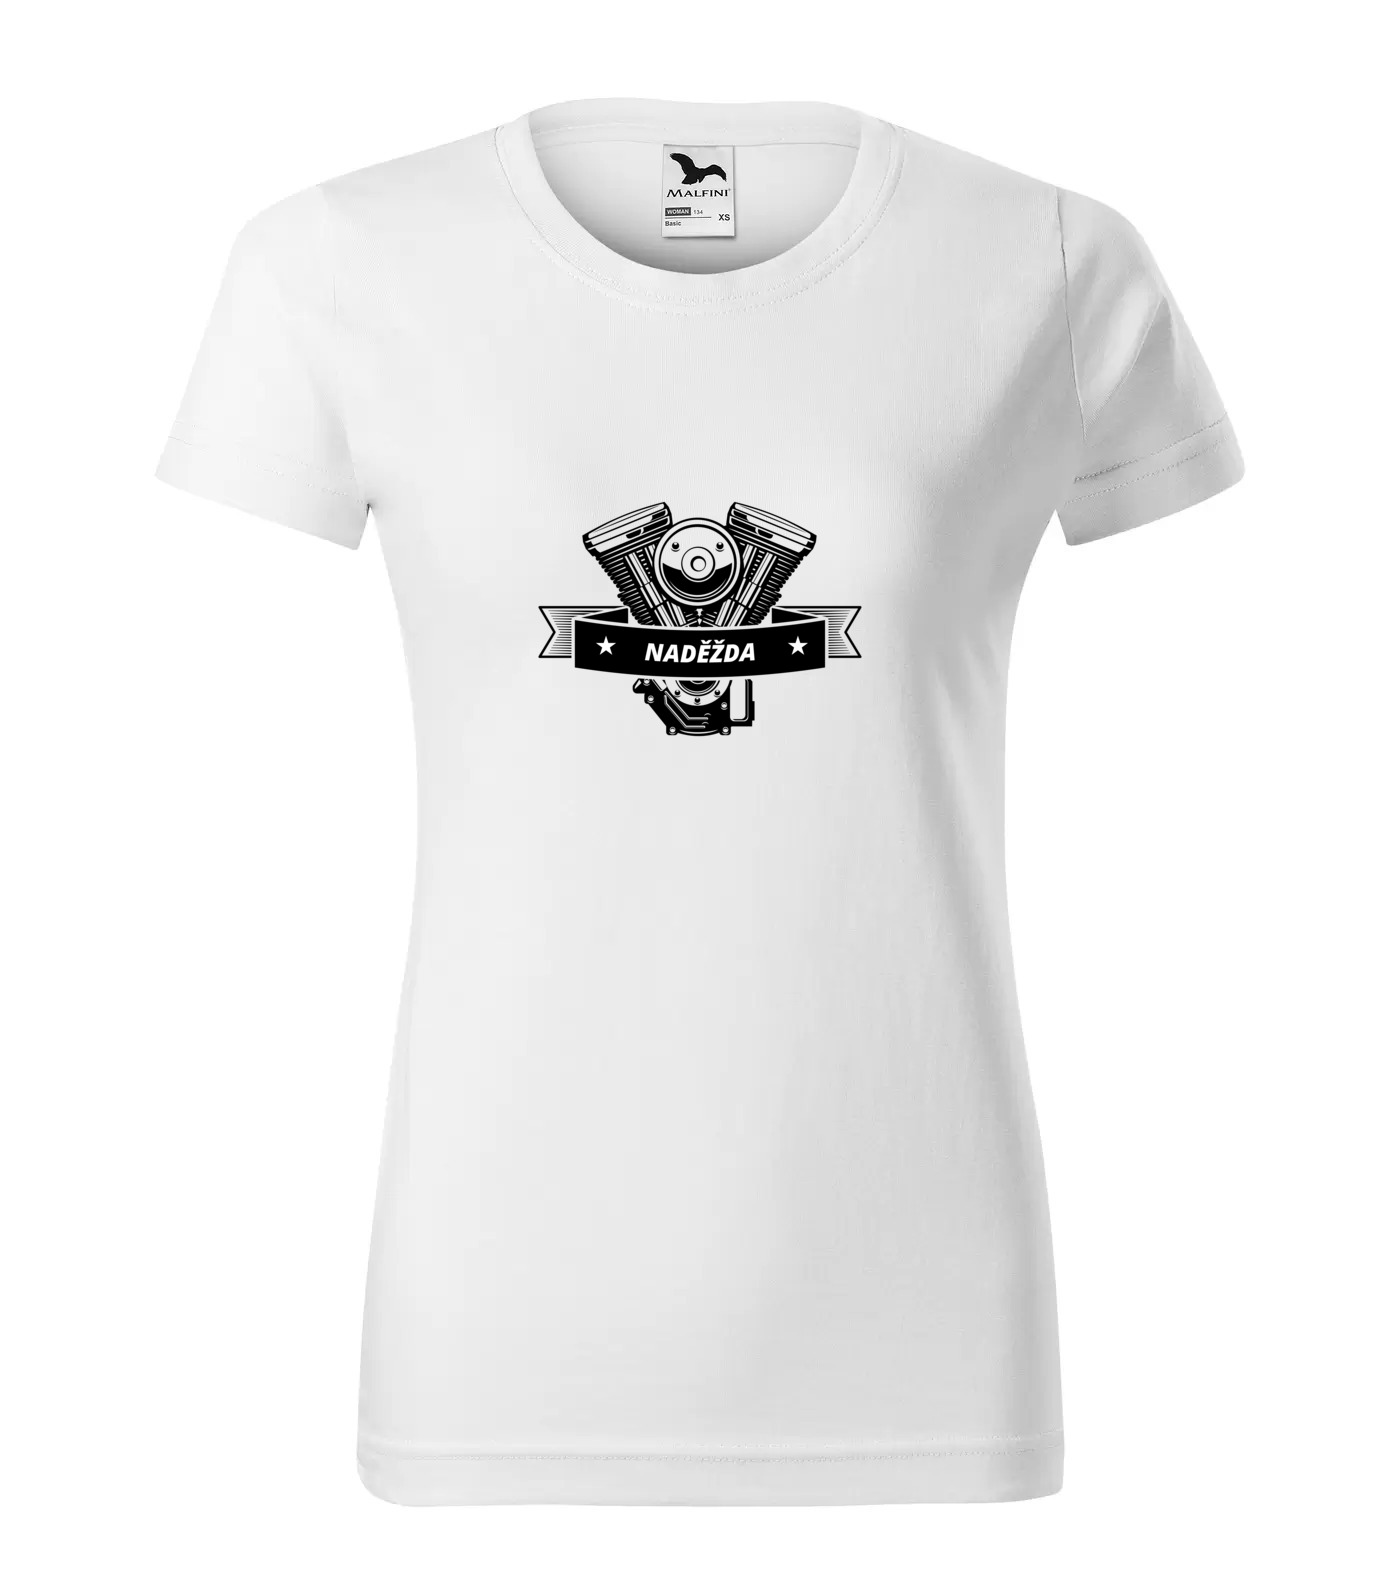 Tričko Motorkářka Naděžda